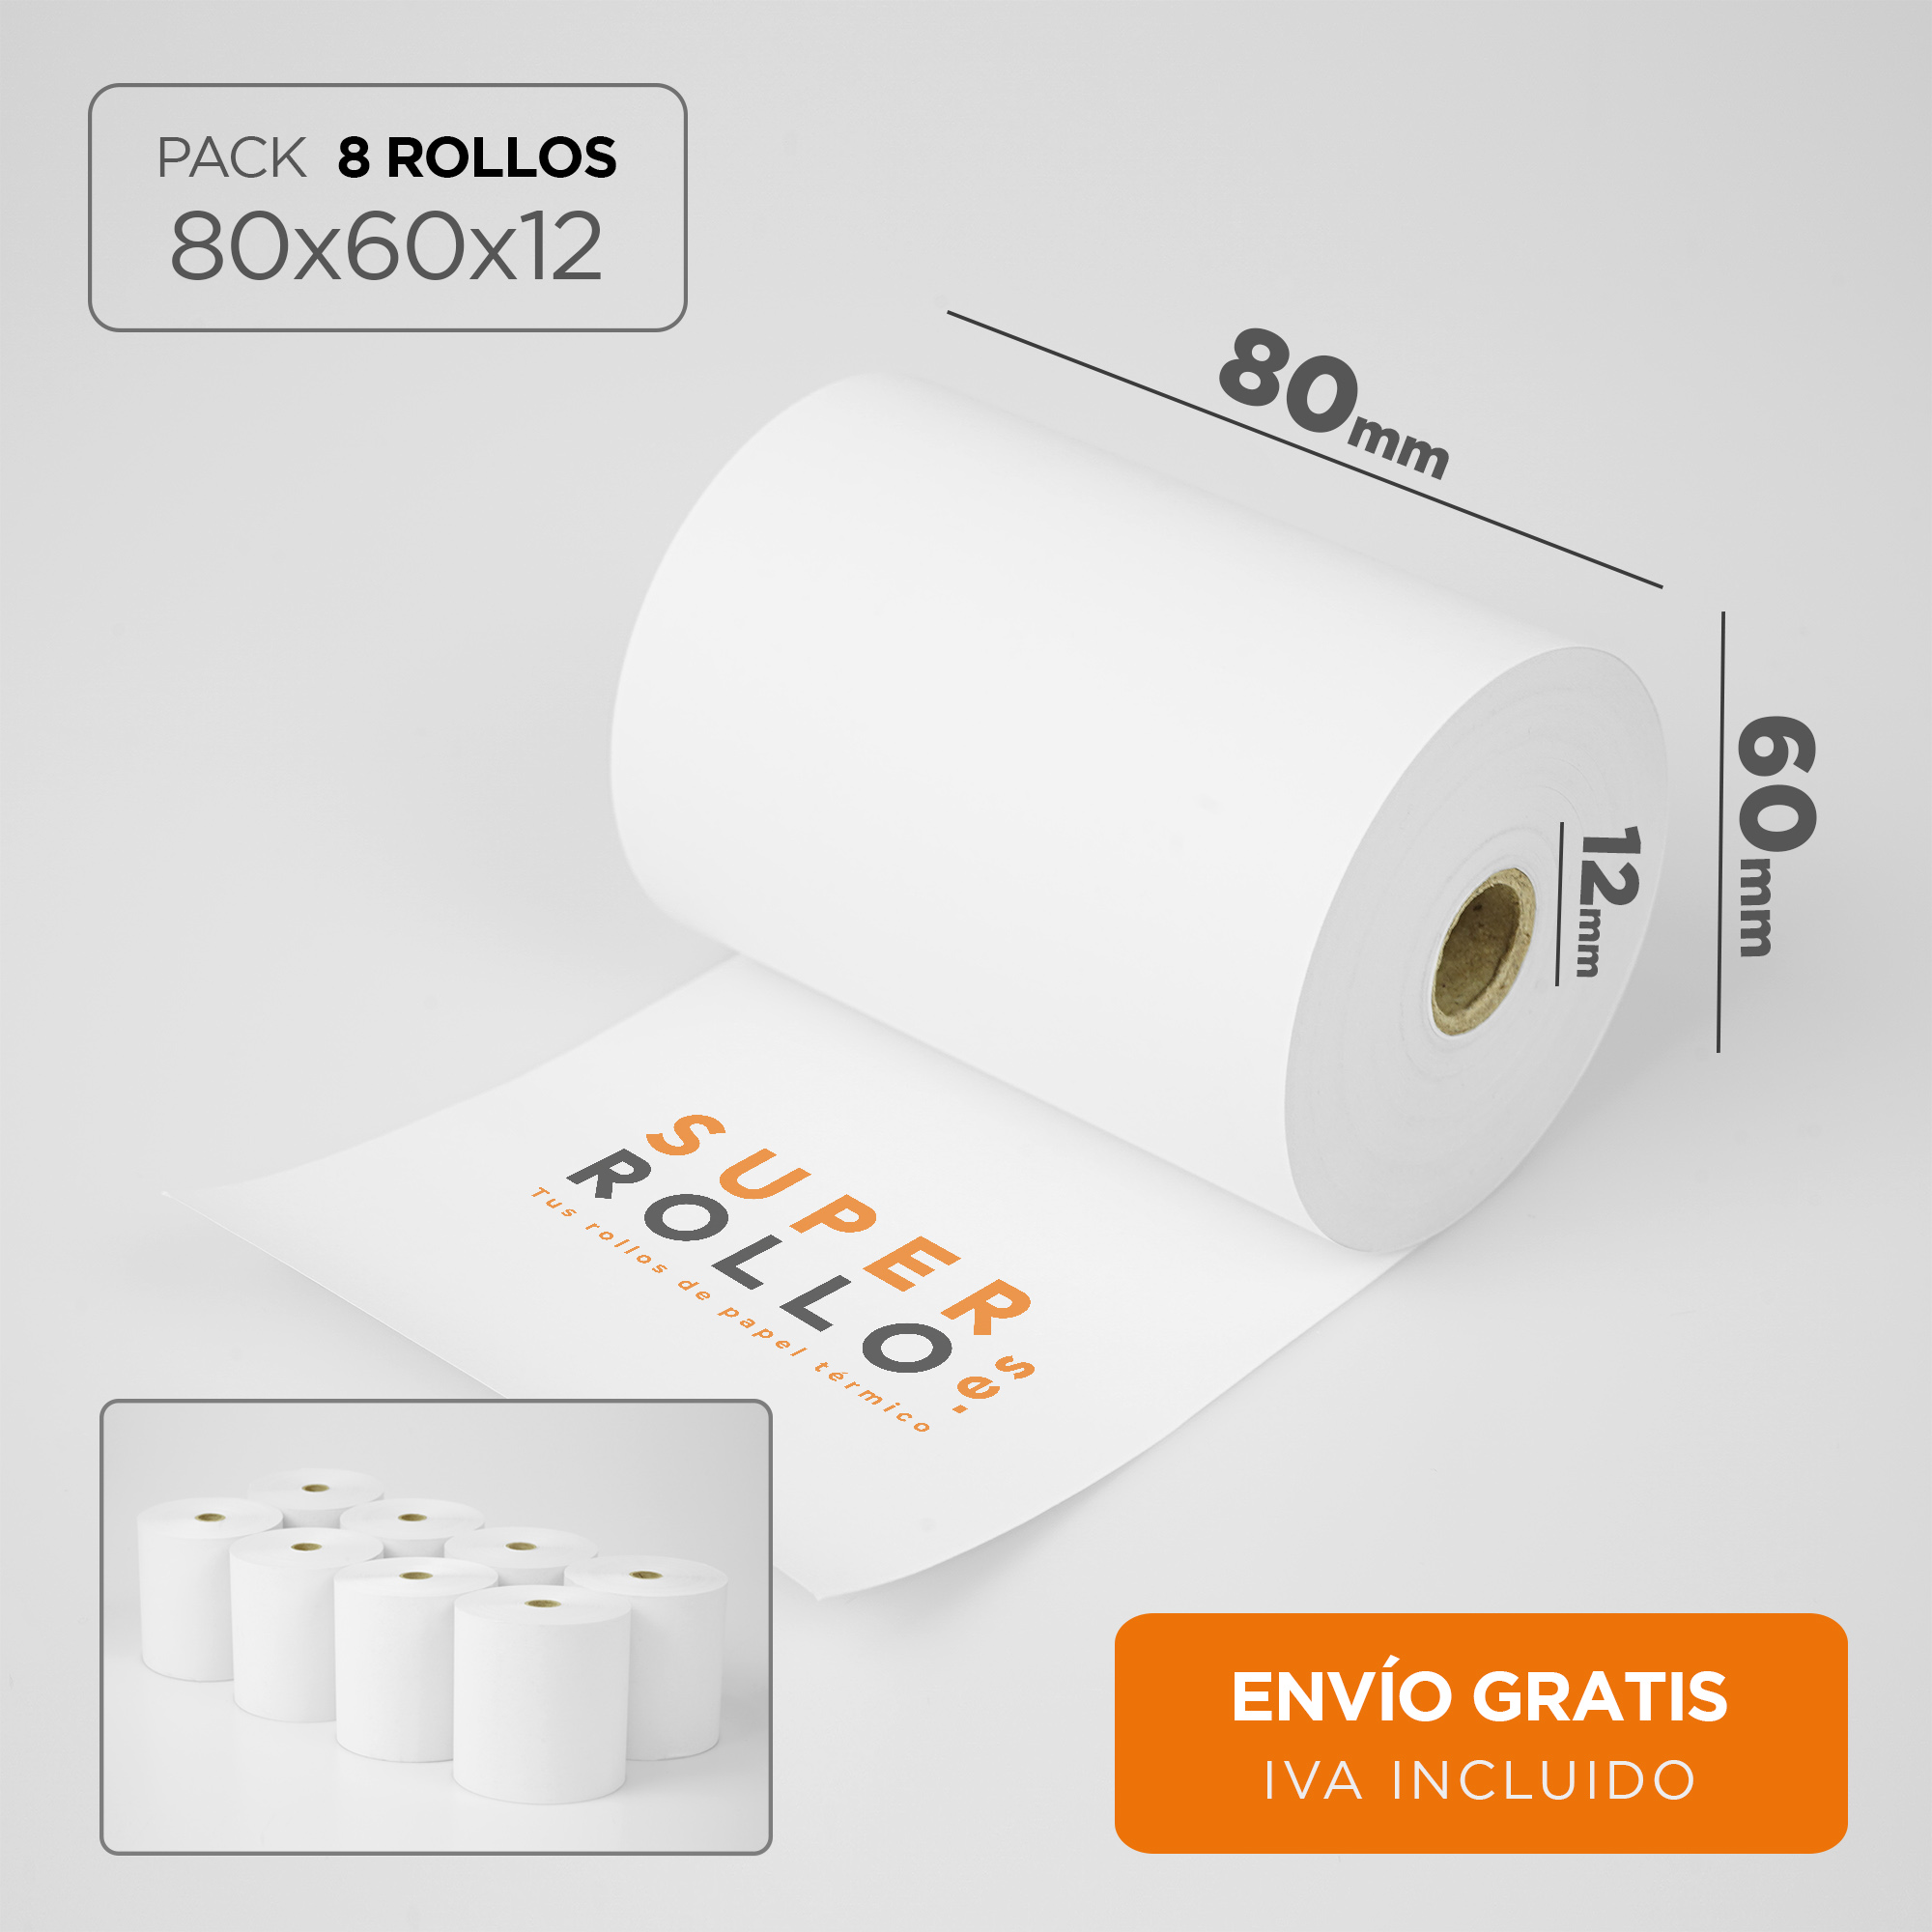 PACK_8-ROLLOS_80x60x12